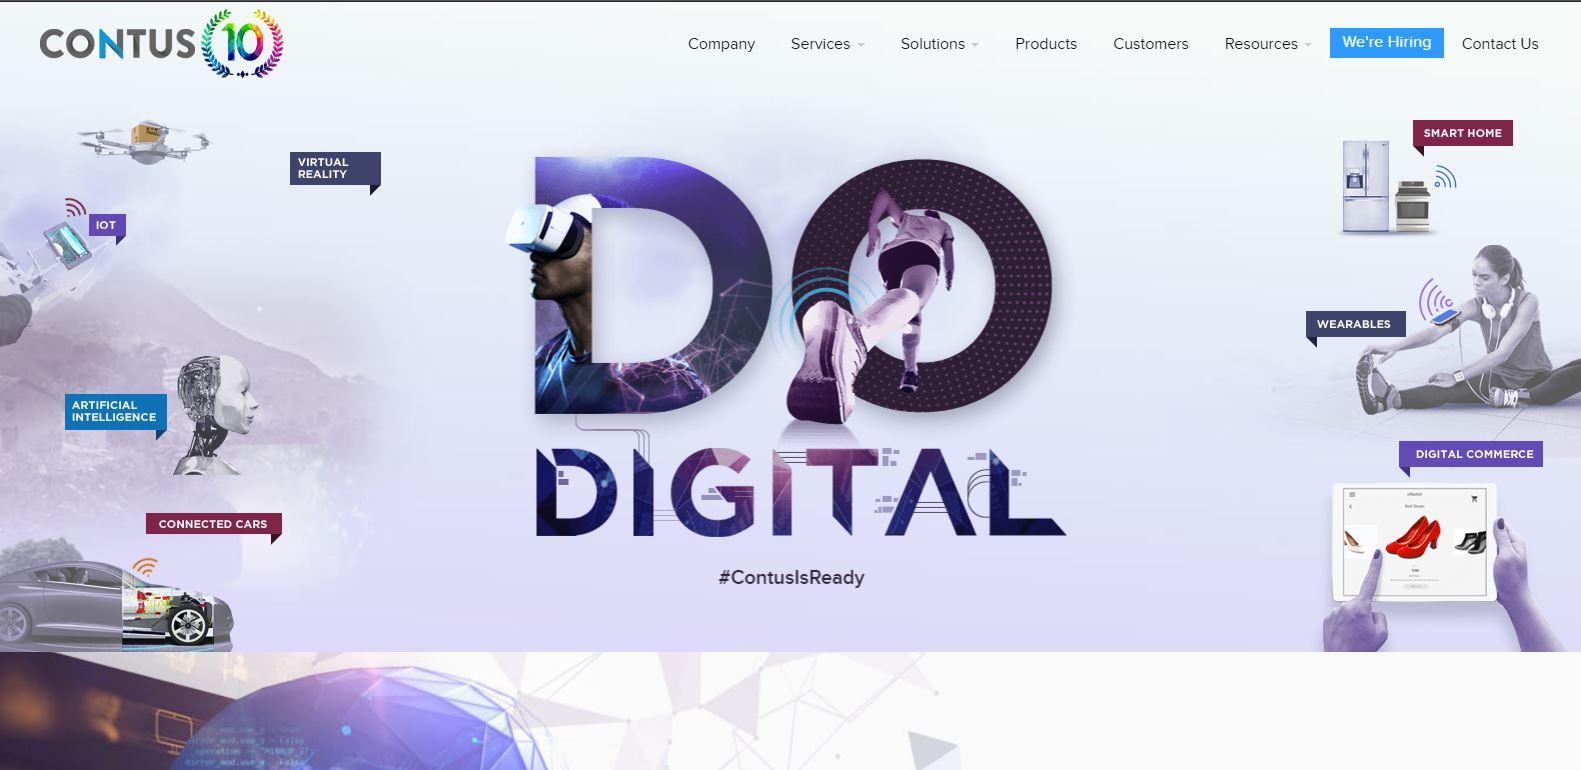 Contus mobile app development companies